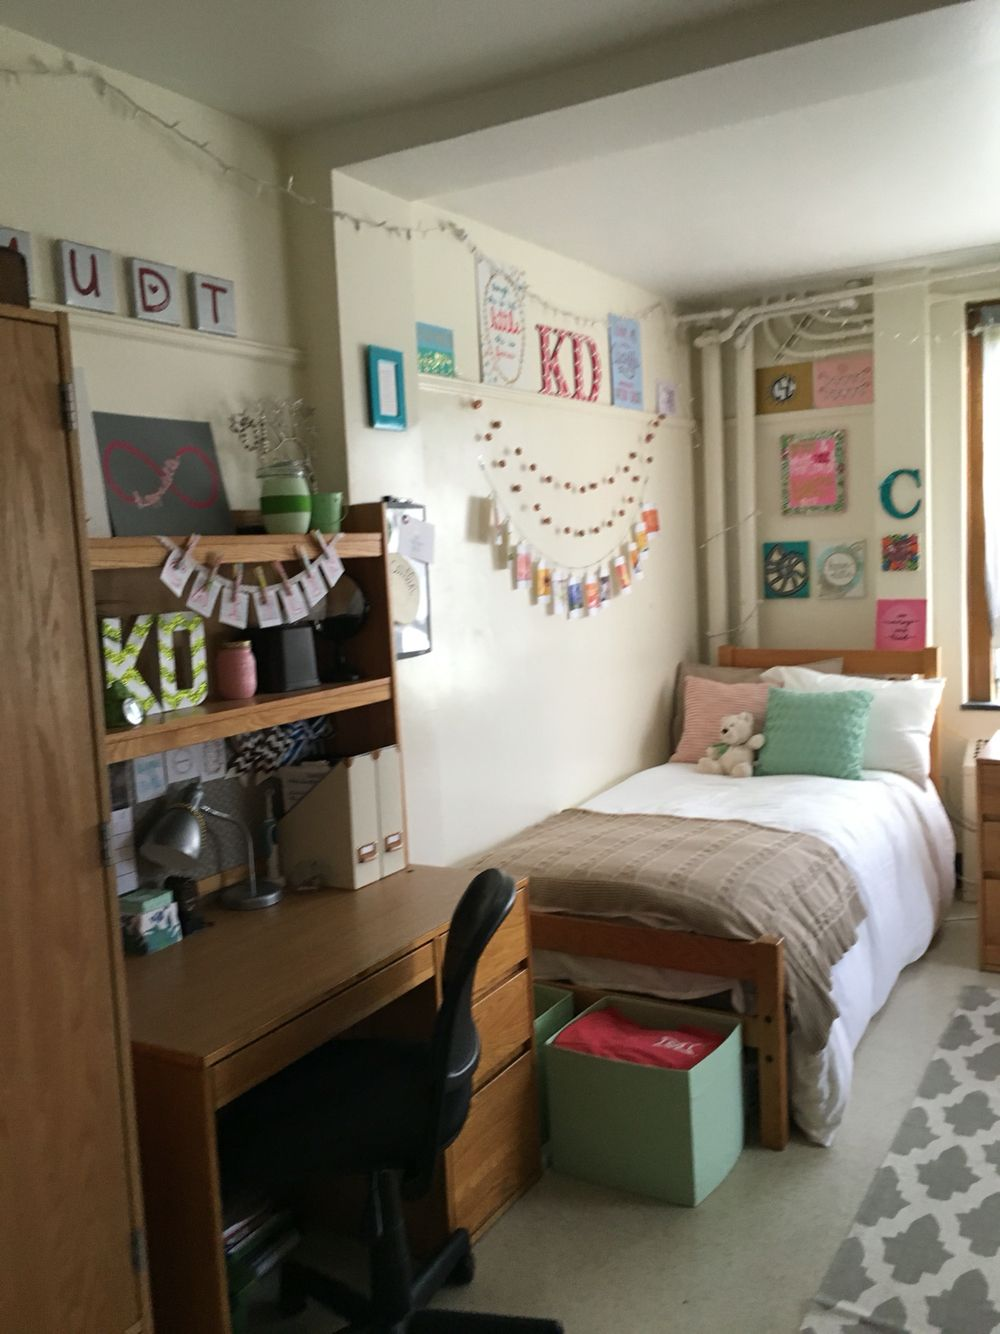 Scott Hall Miami university dorm  Dorm rooms in 2019